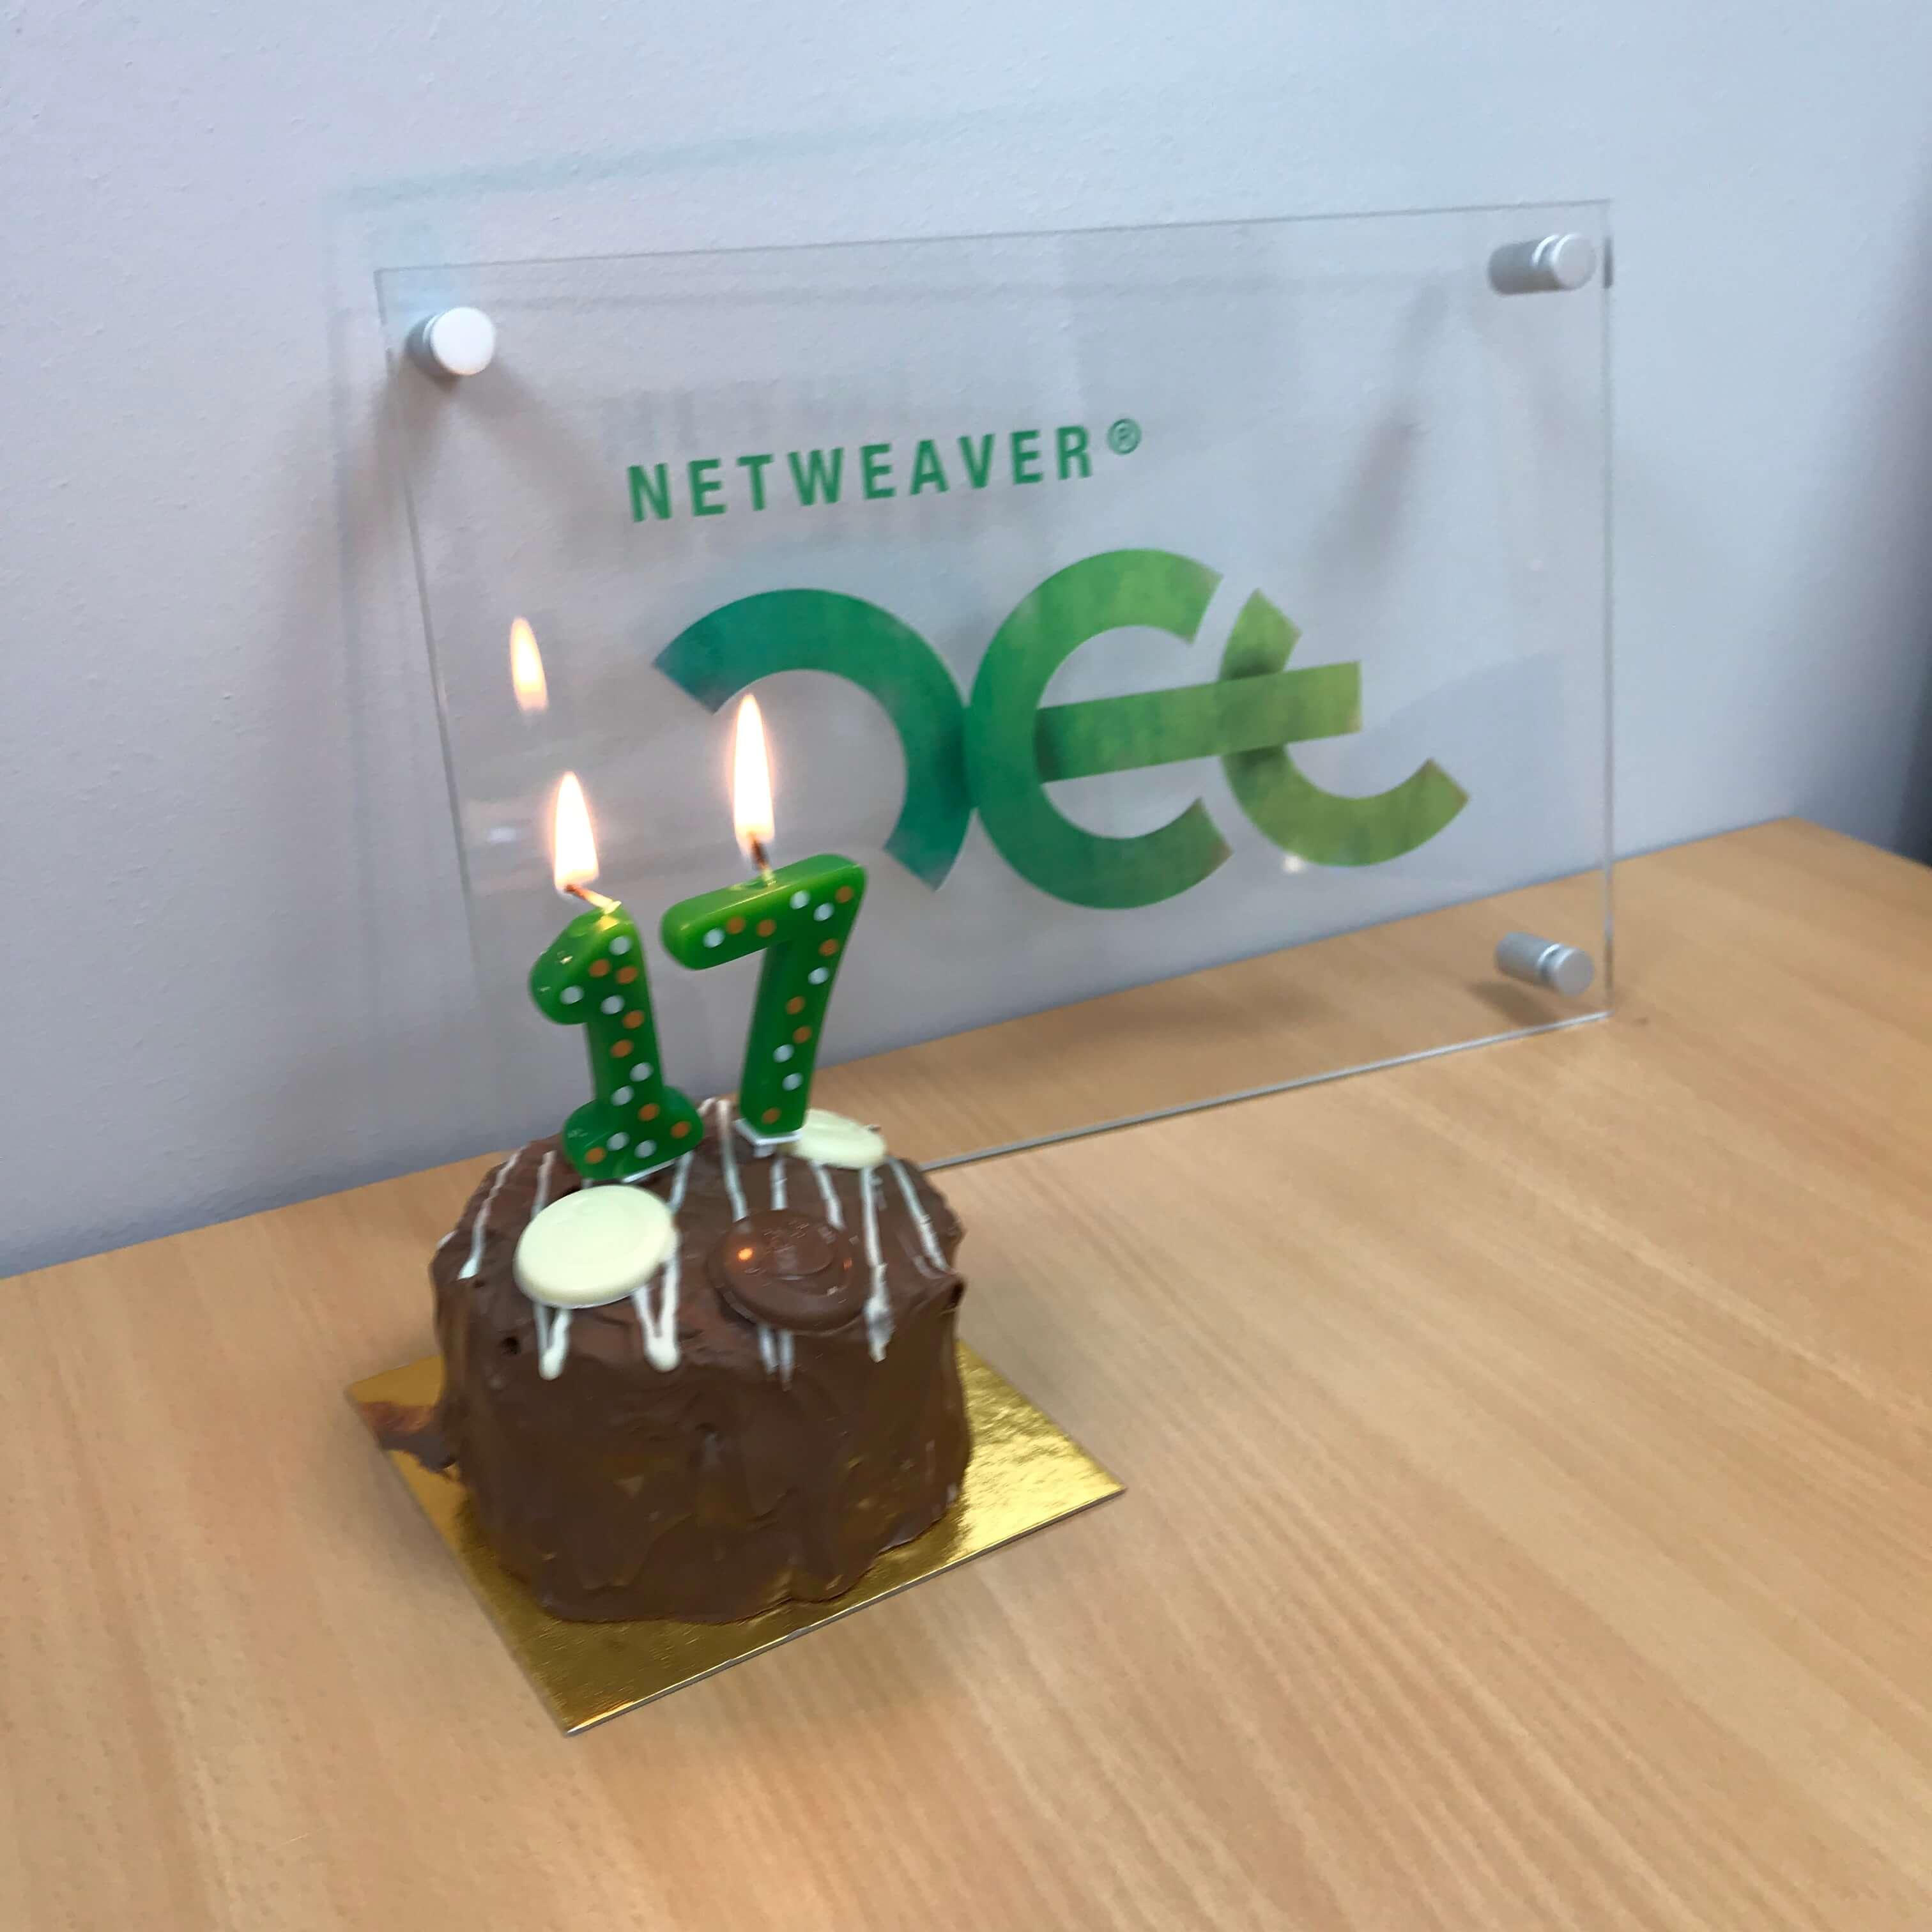 Happy Birthday to NetWeaver – 17 years old